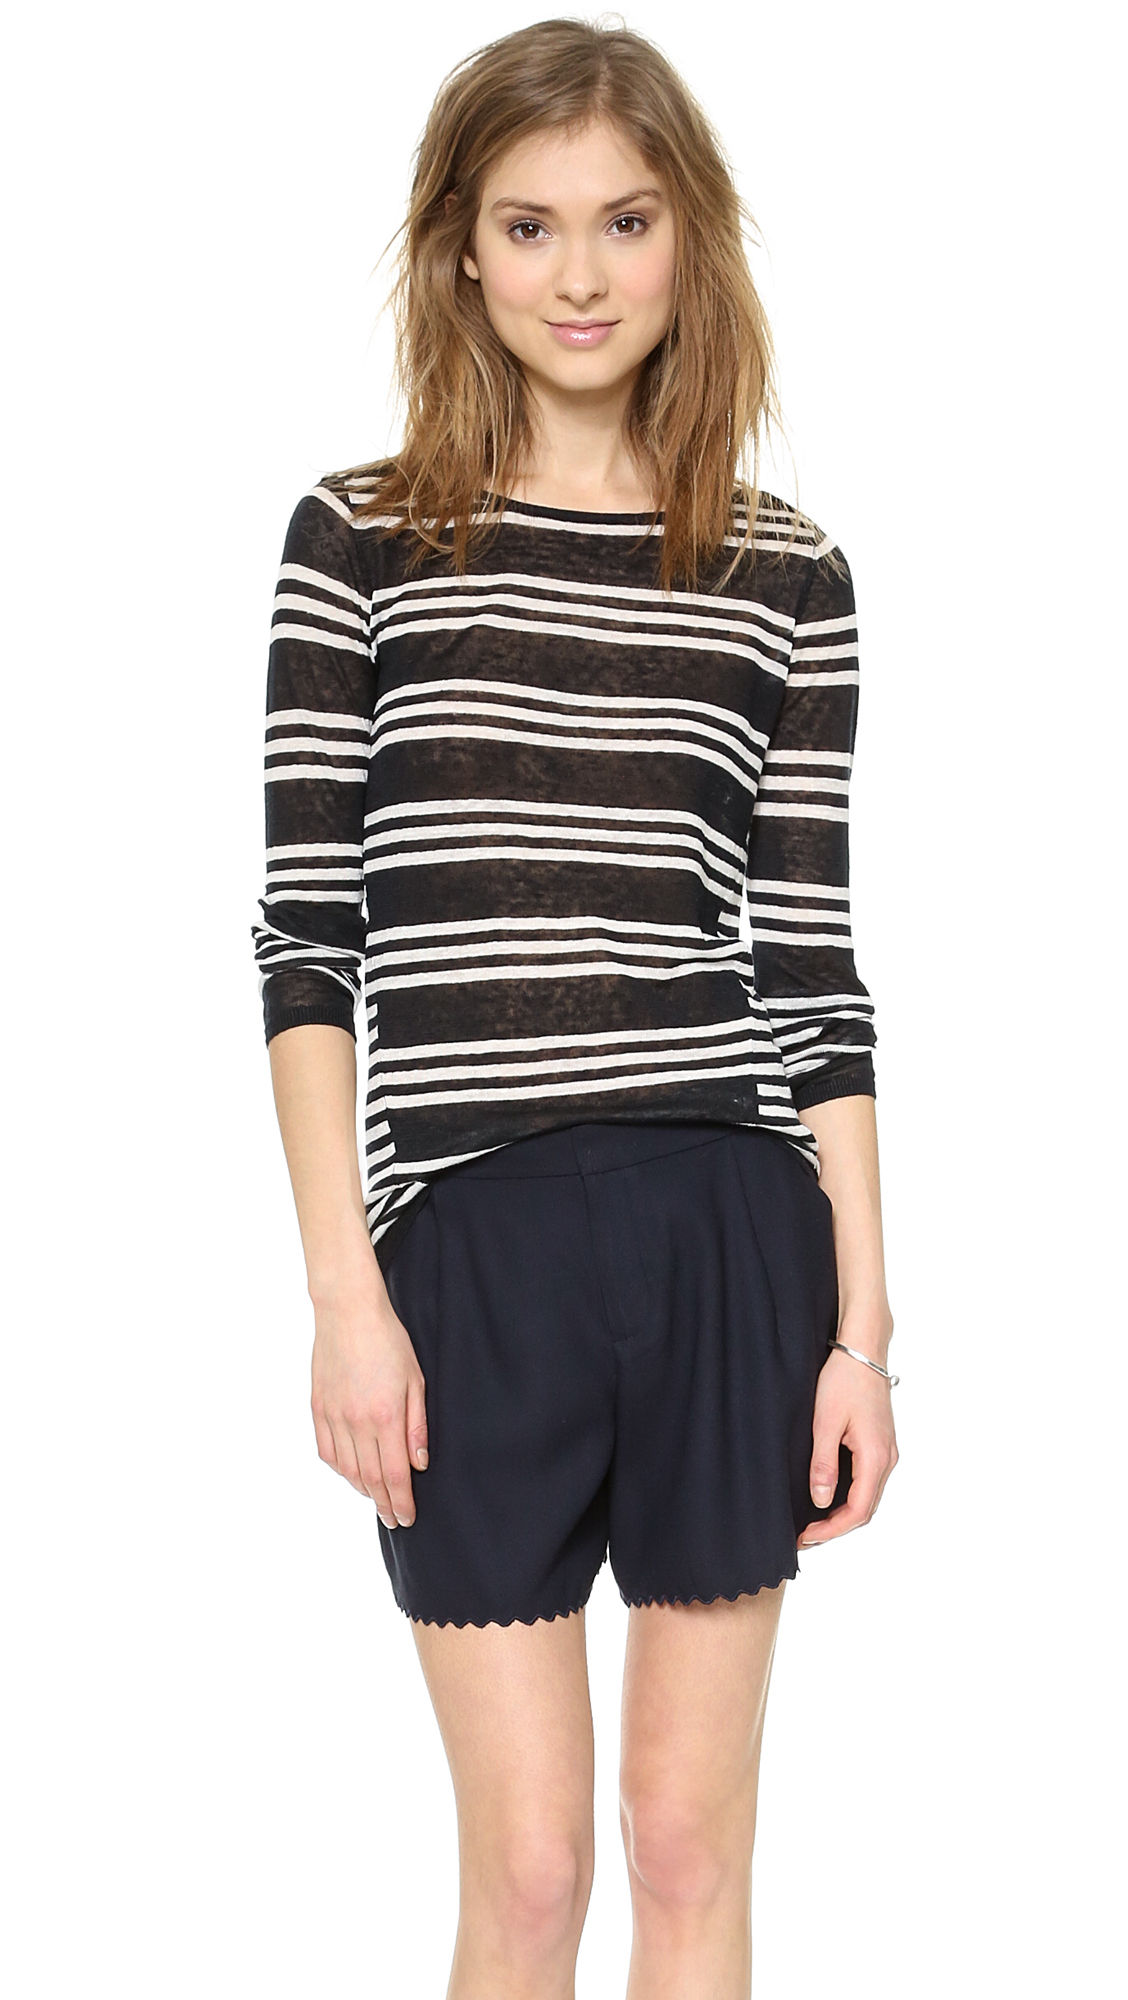 5cacc62f32 Club Monaco Lana Sweater | Pinterest Picks - Black and White Stripes